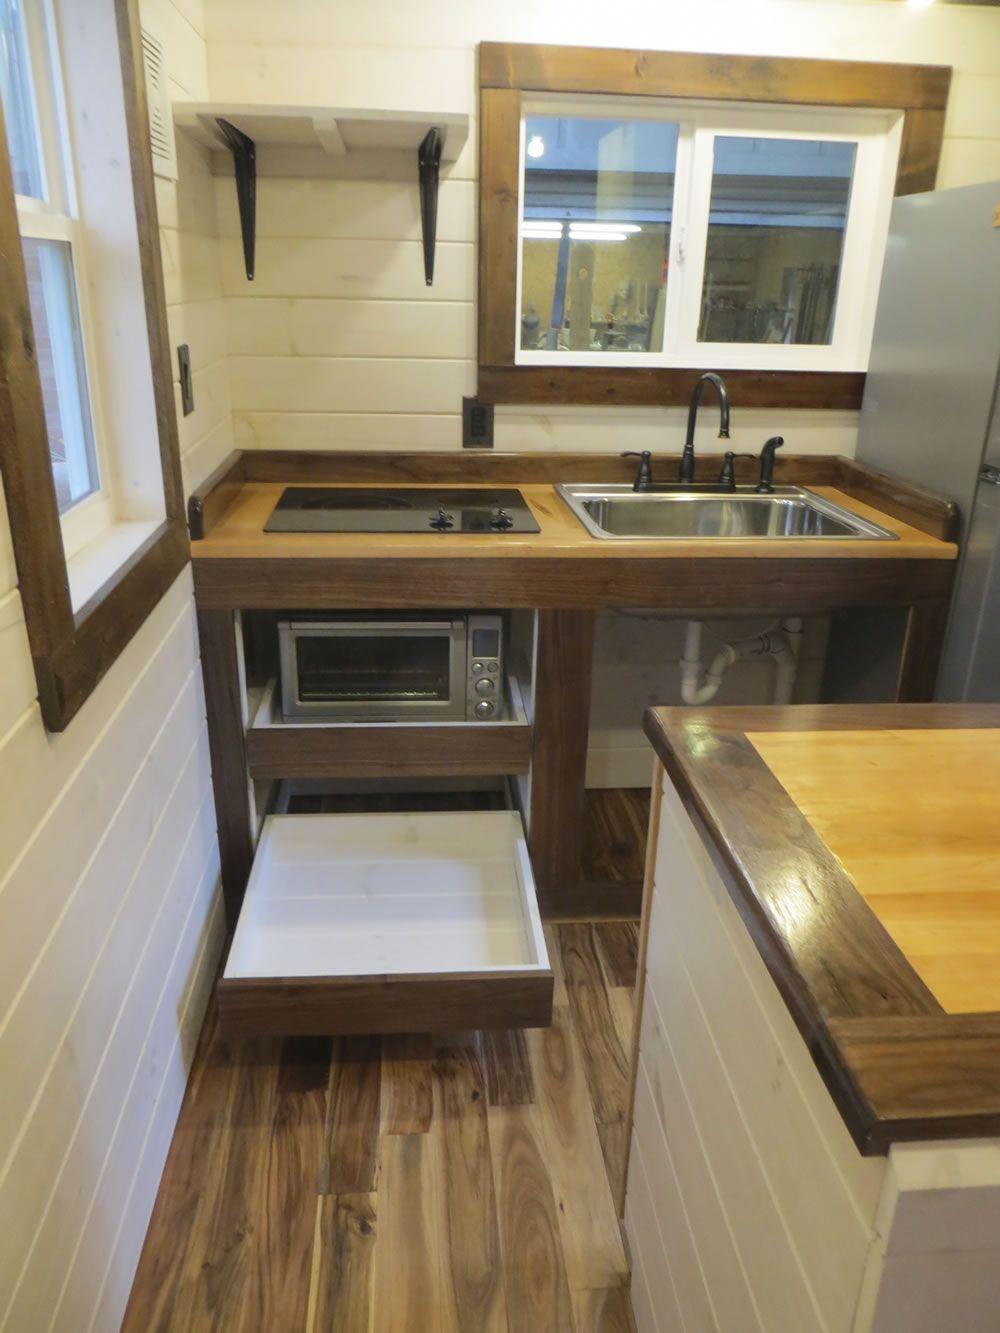 Robins Nest Kitchen-Brevard Tiny House Company | Alternative Housing ...